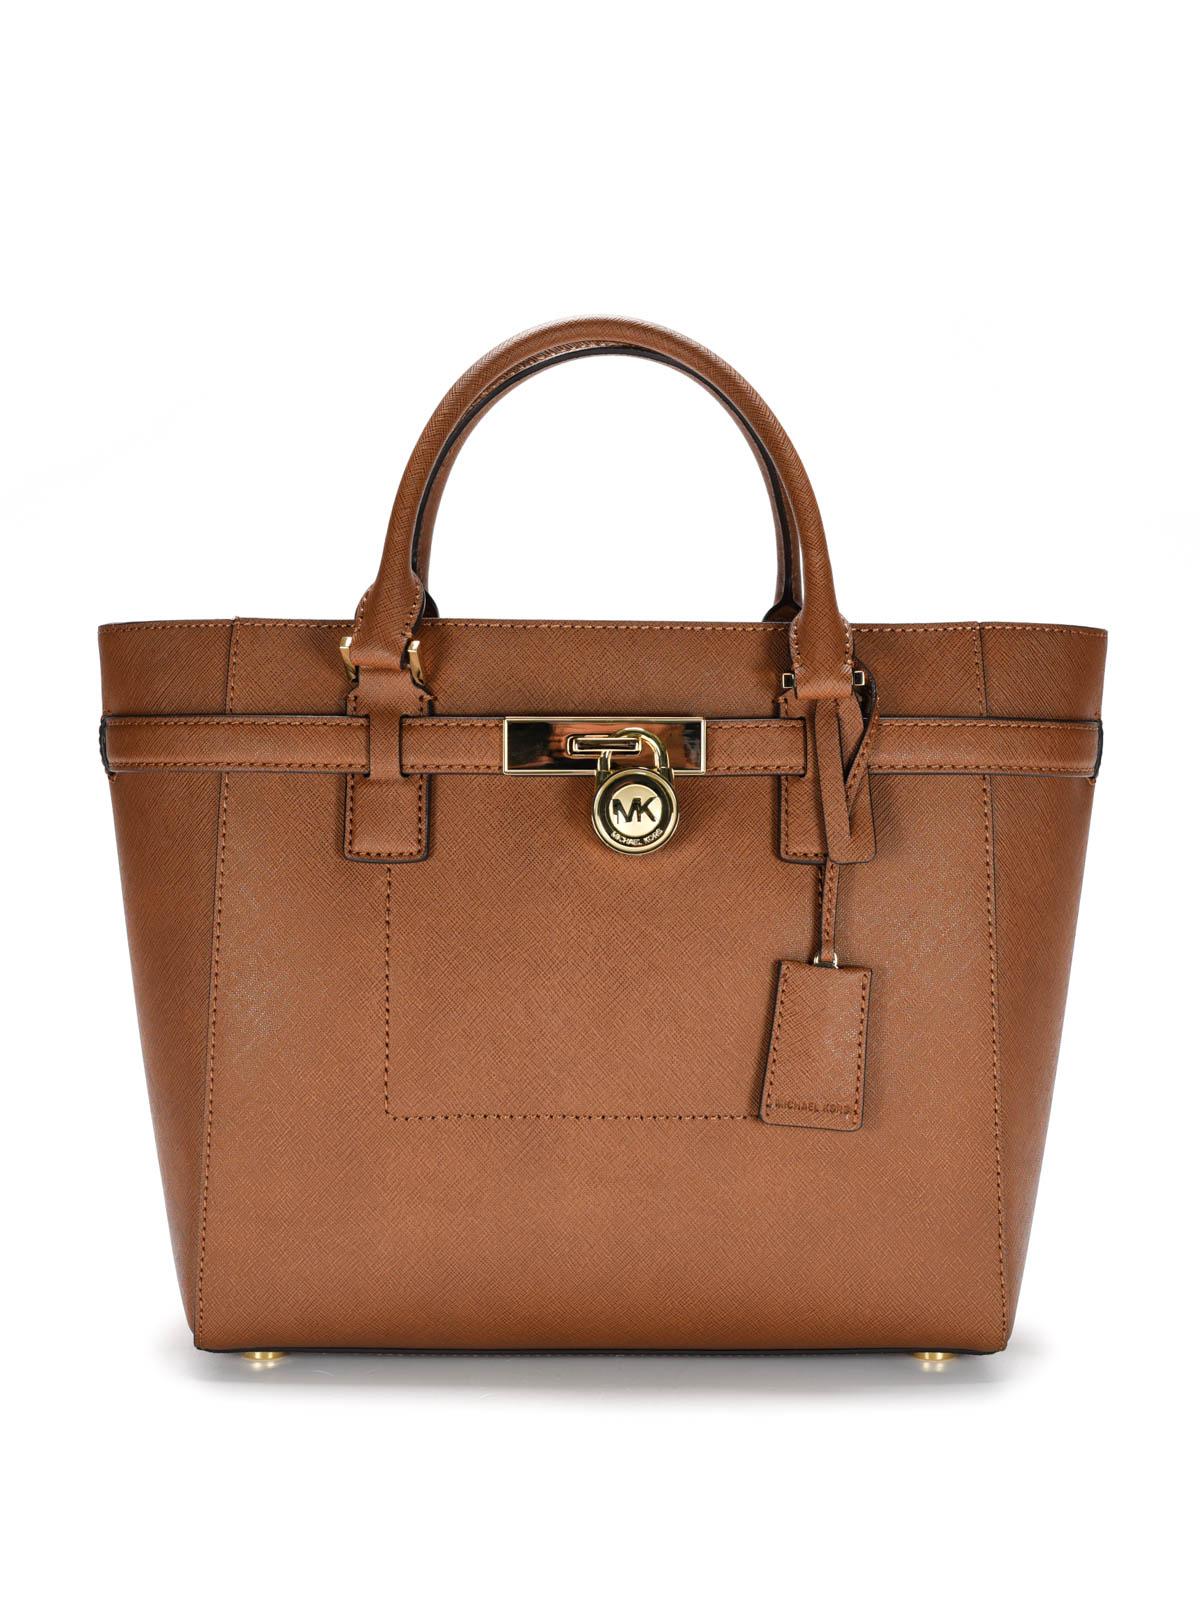 2f9cdf822c067 Michael Kors Saffiano Leather Tote Bag